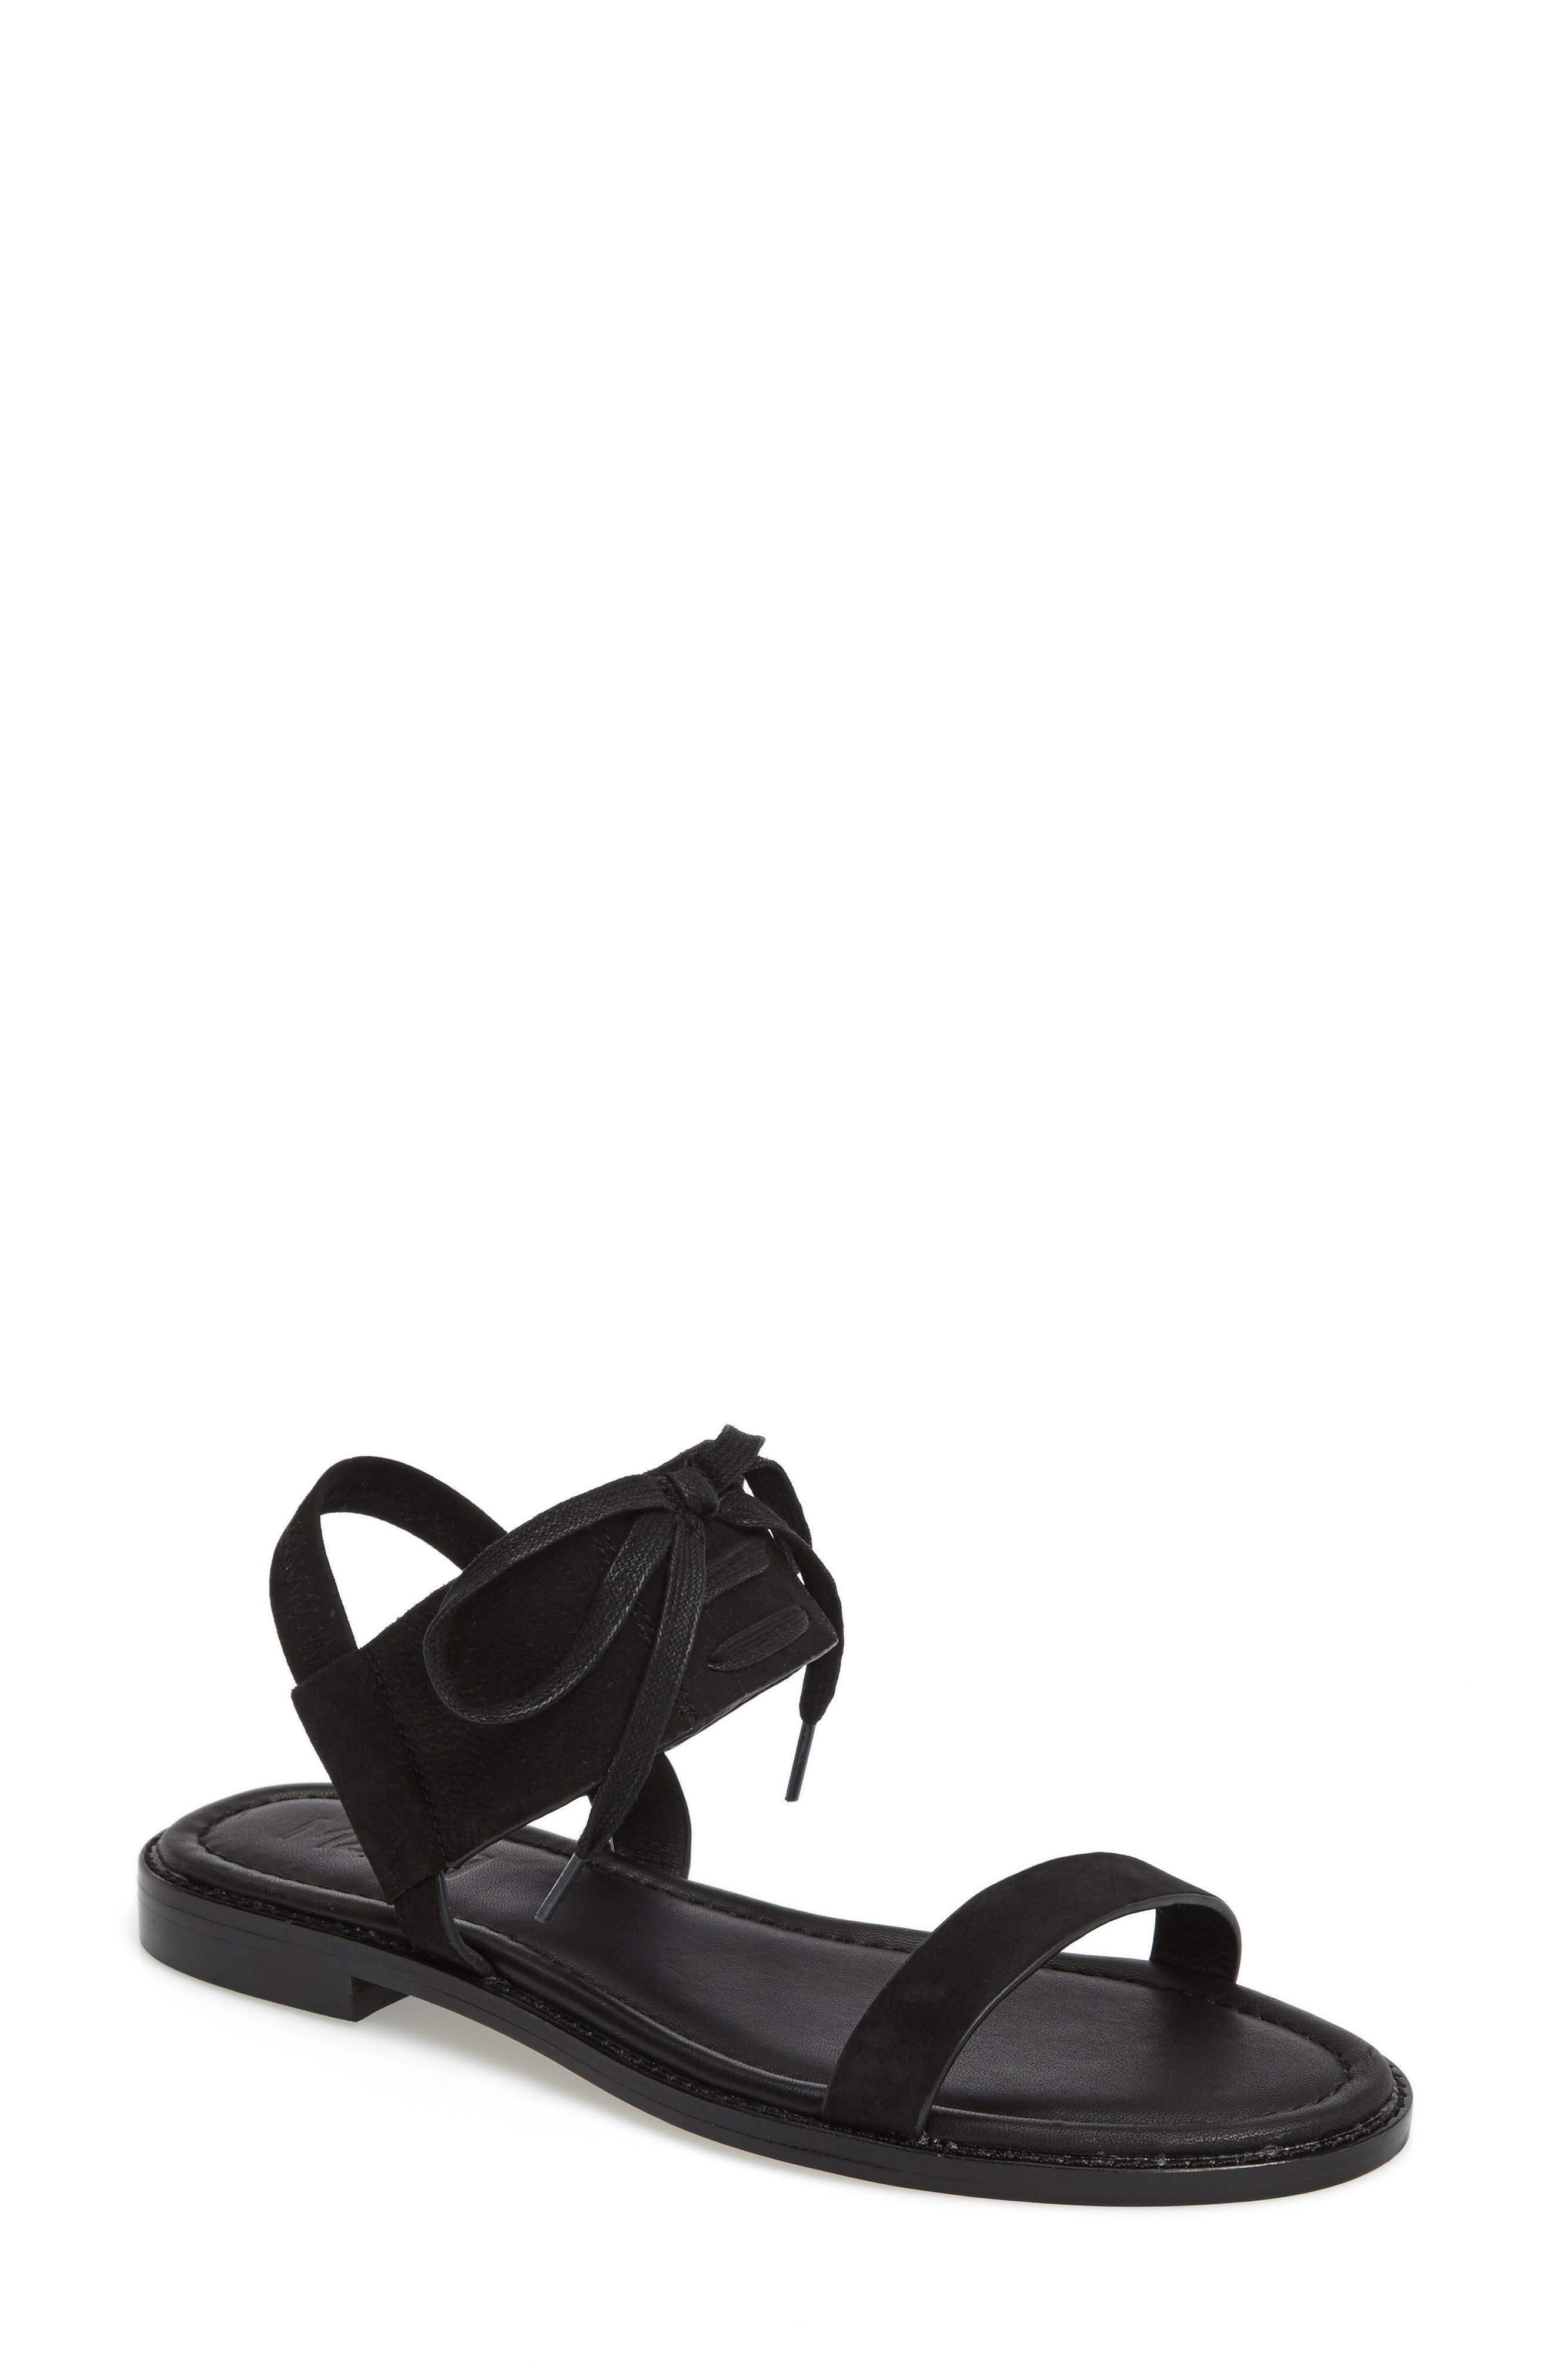 M4D3 Hailey Slingback Sandal,                             Main thumbnail 1, color,                             001